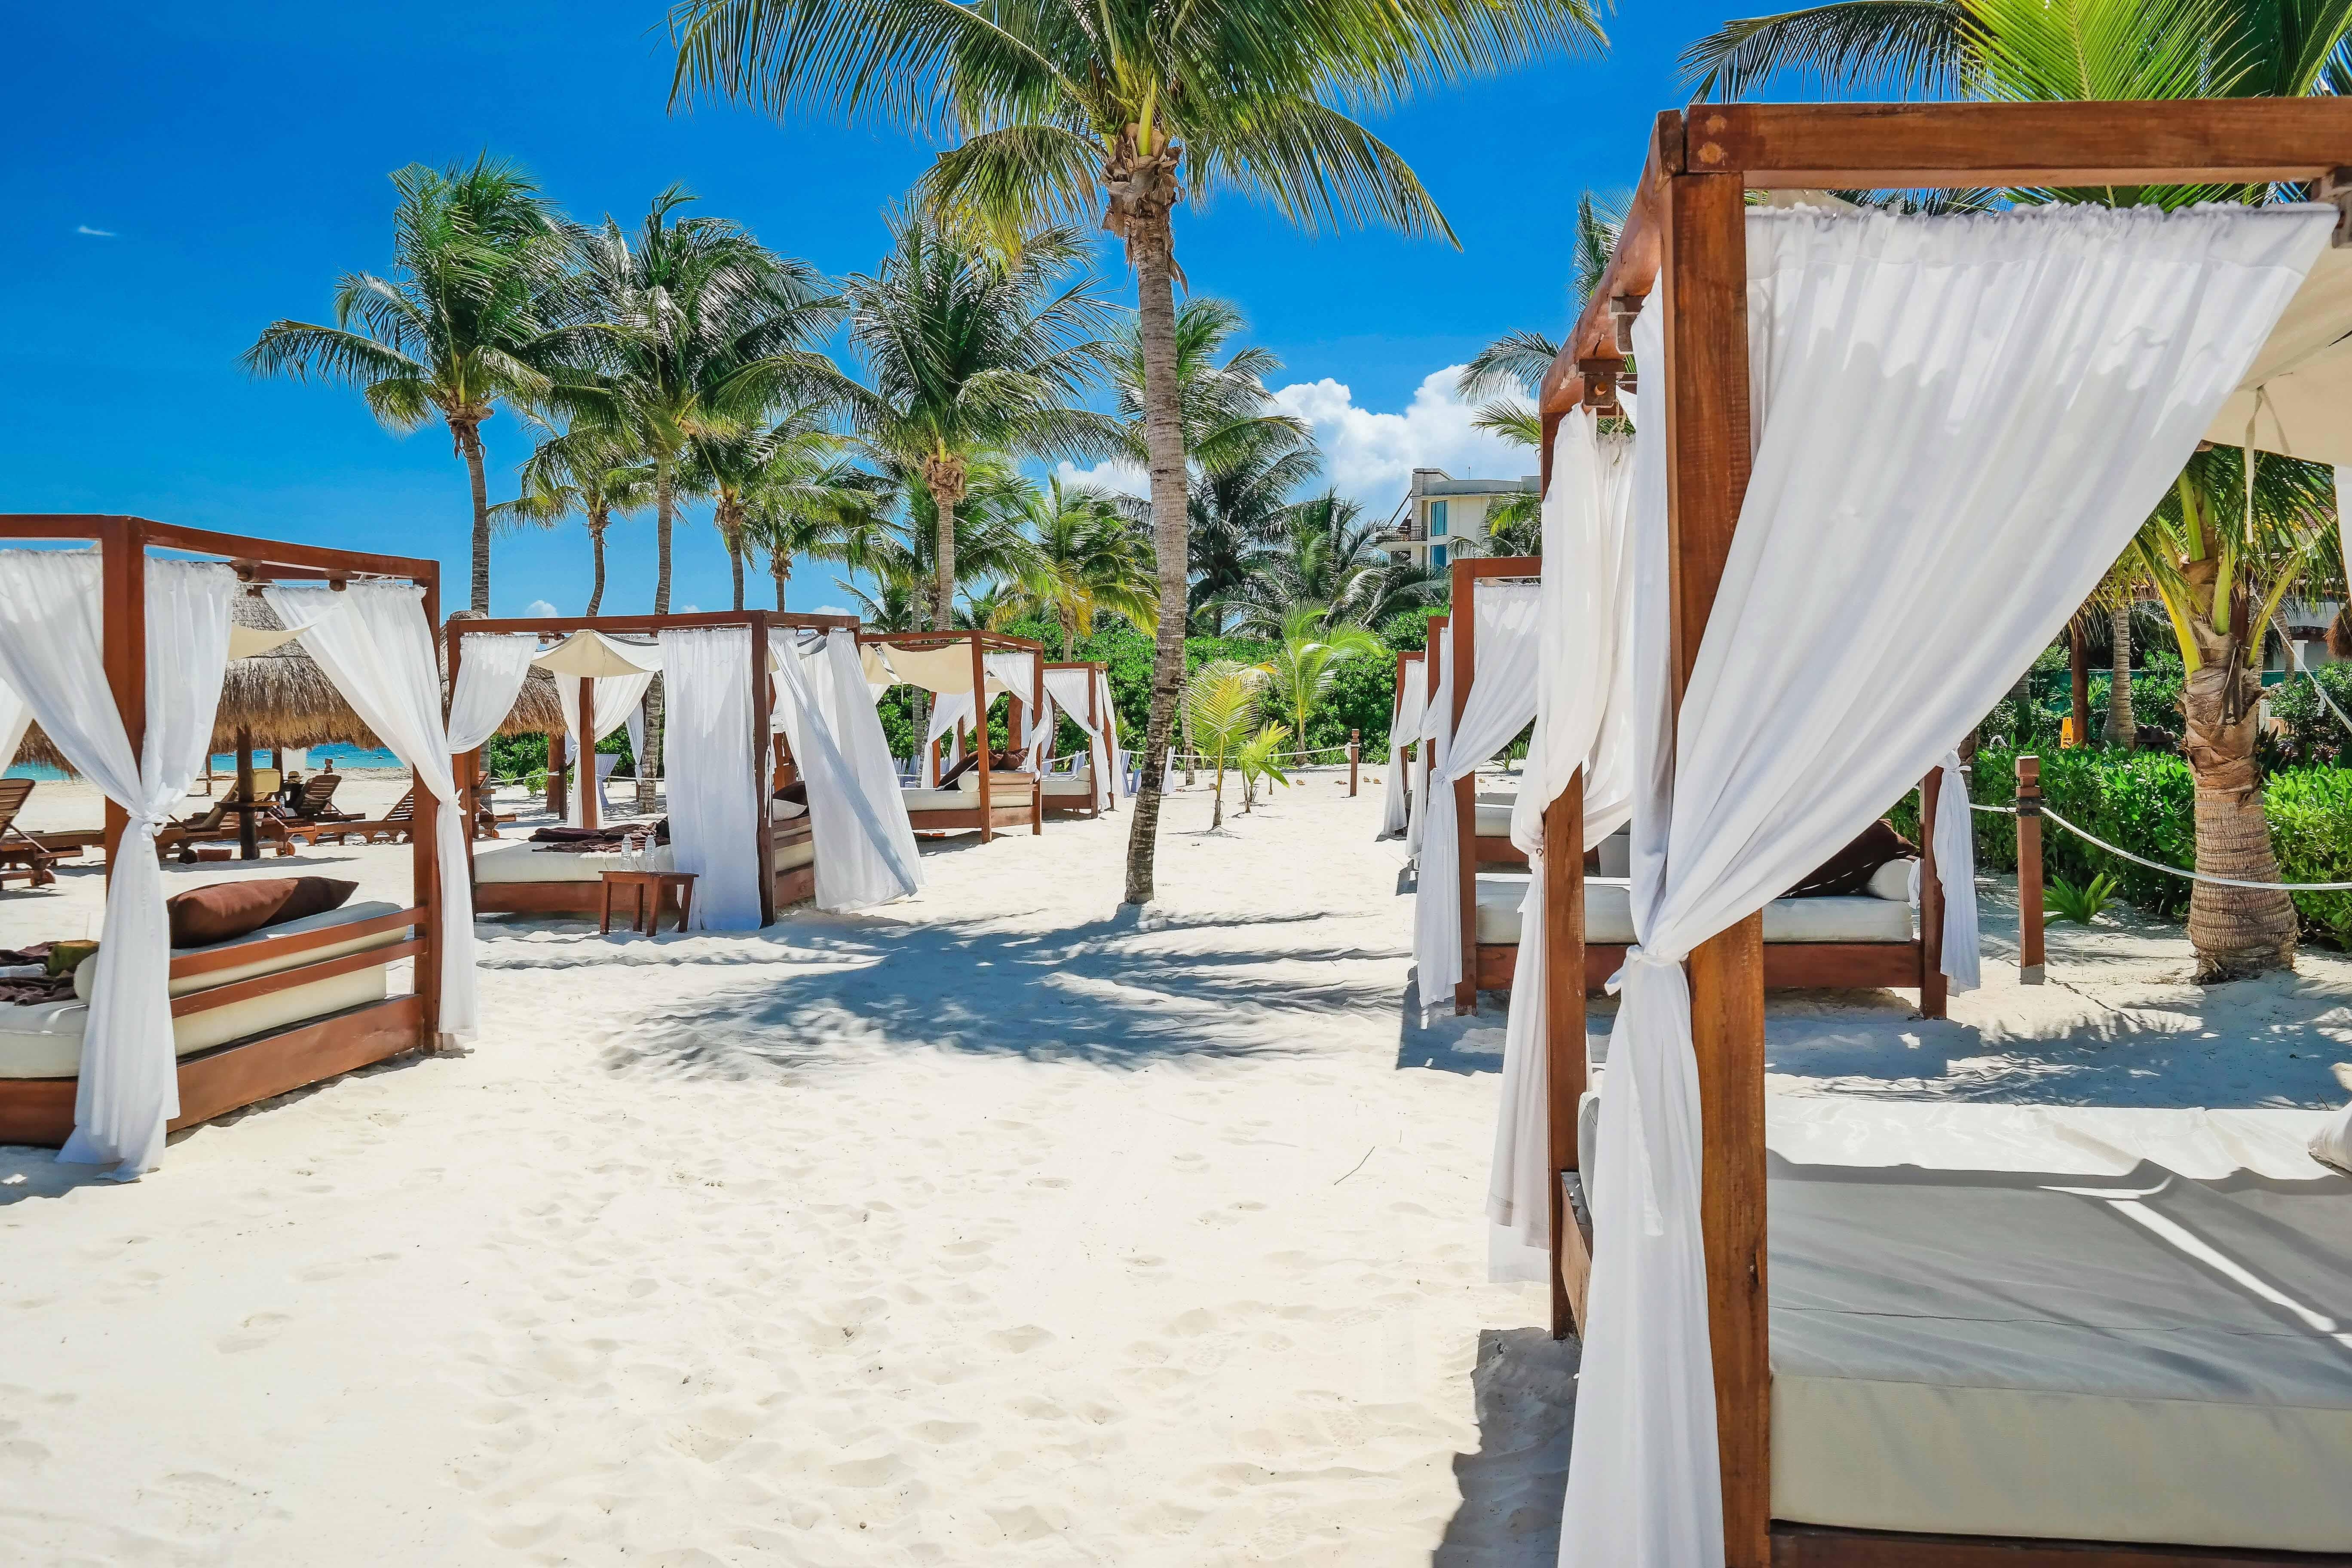 Excellence Riviera - Cancun, Mexico